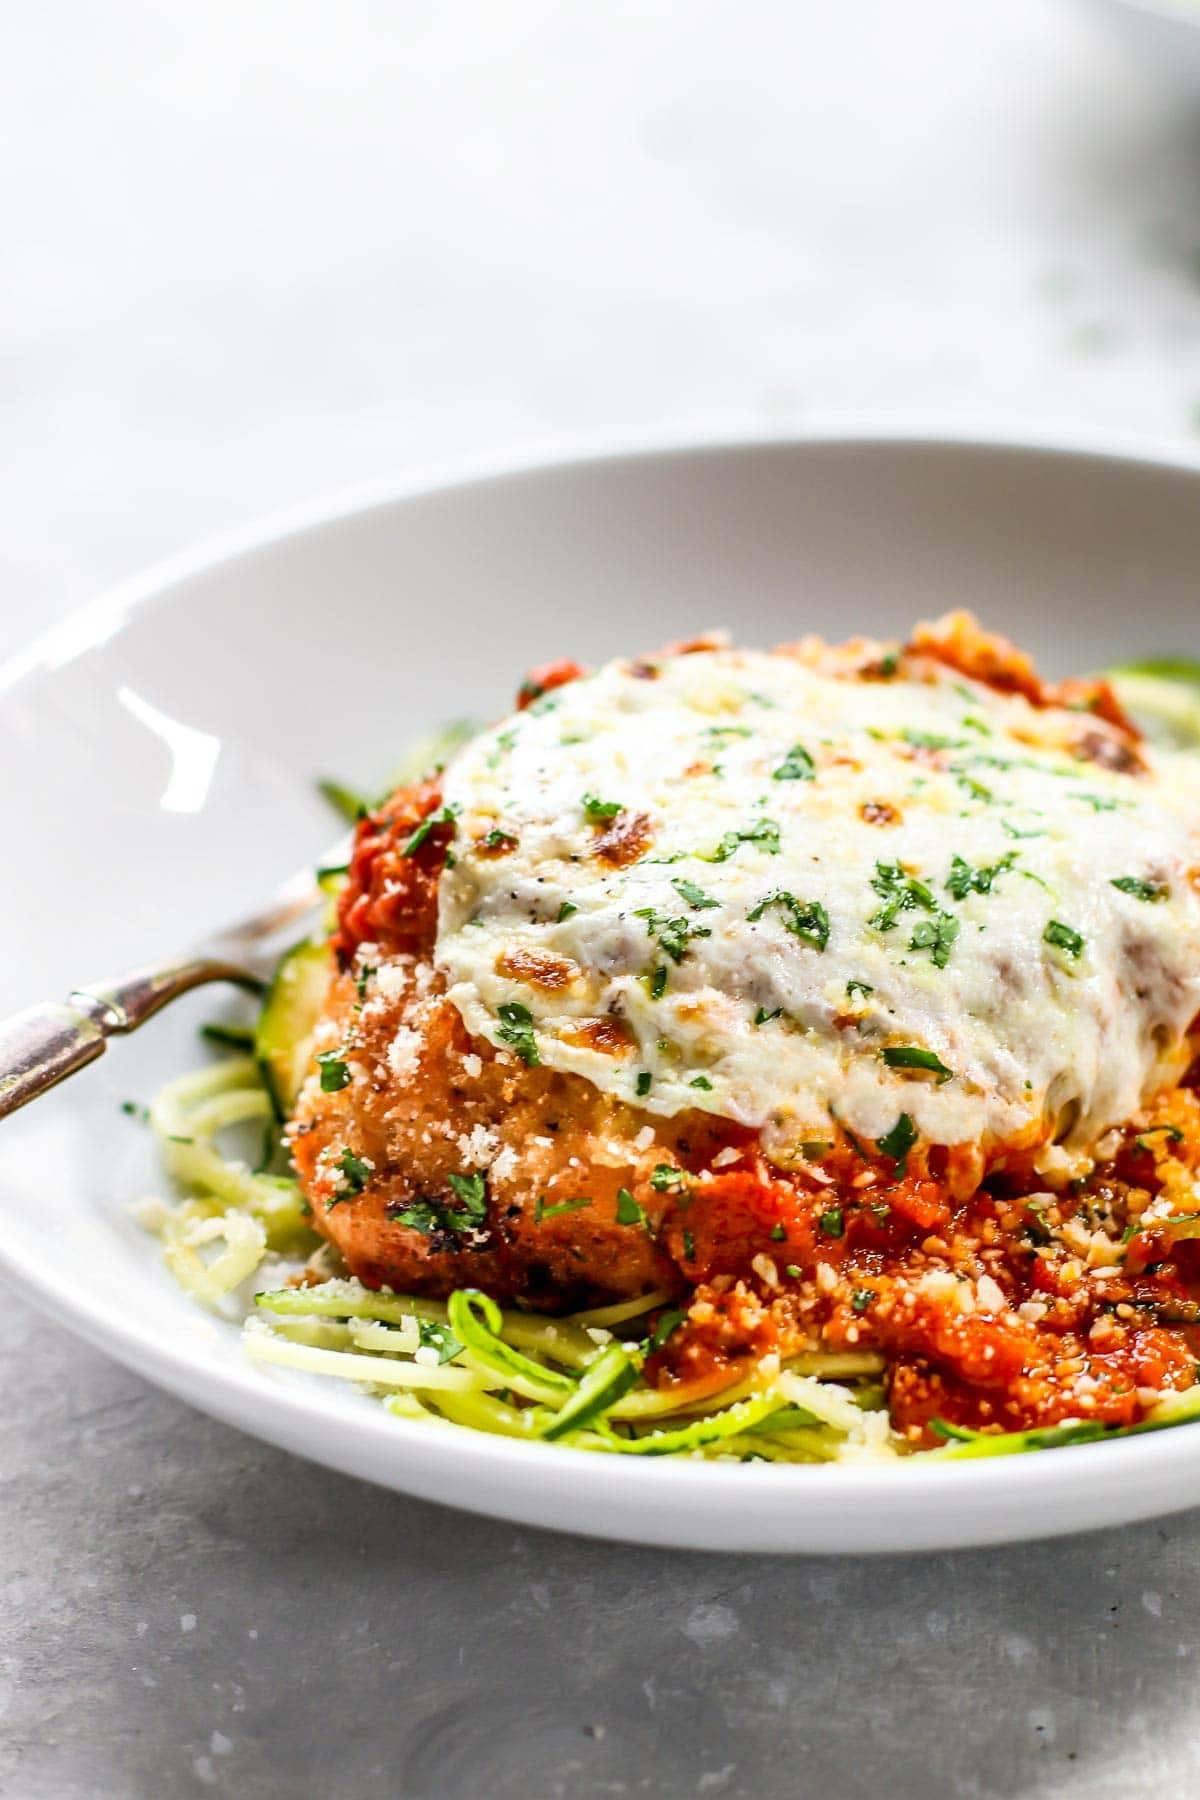 20 Minute Healthy Chicken Parmesan Recipe Easy Prep Simple Ingredients So Good